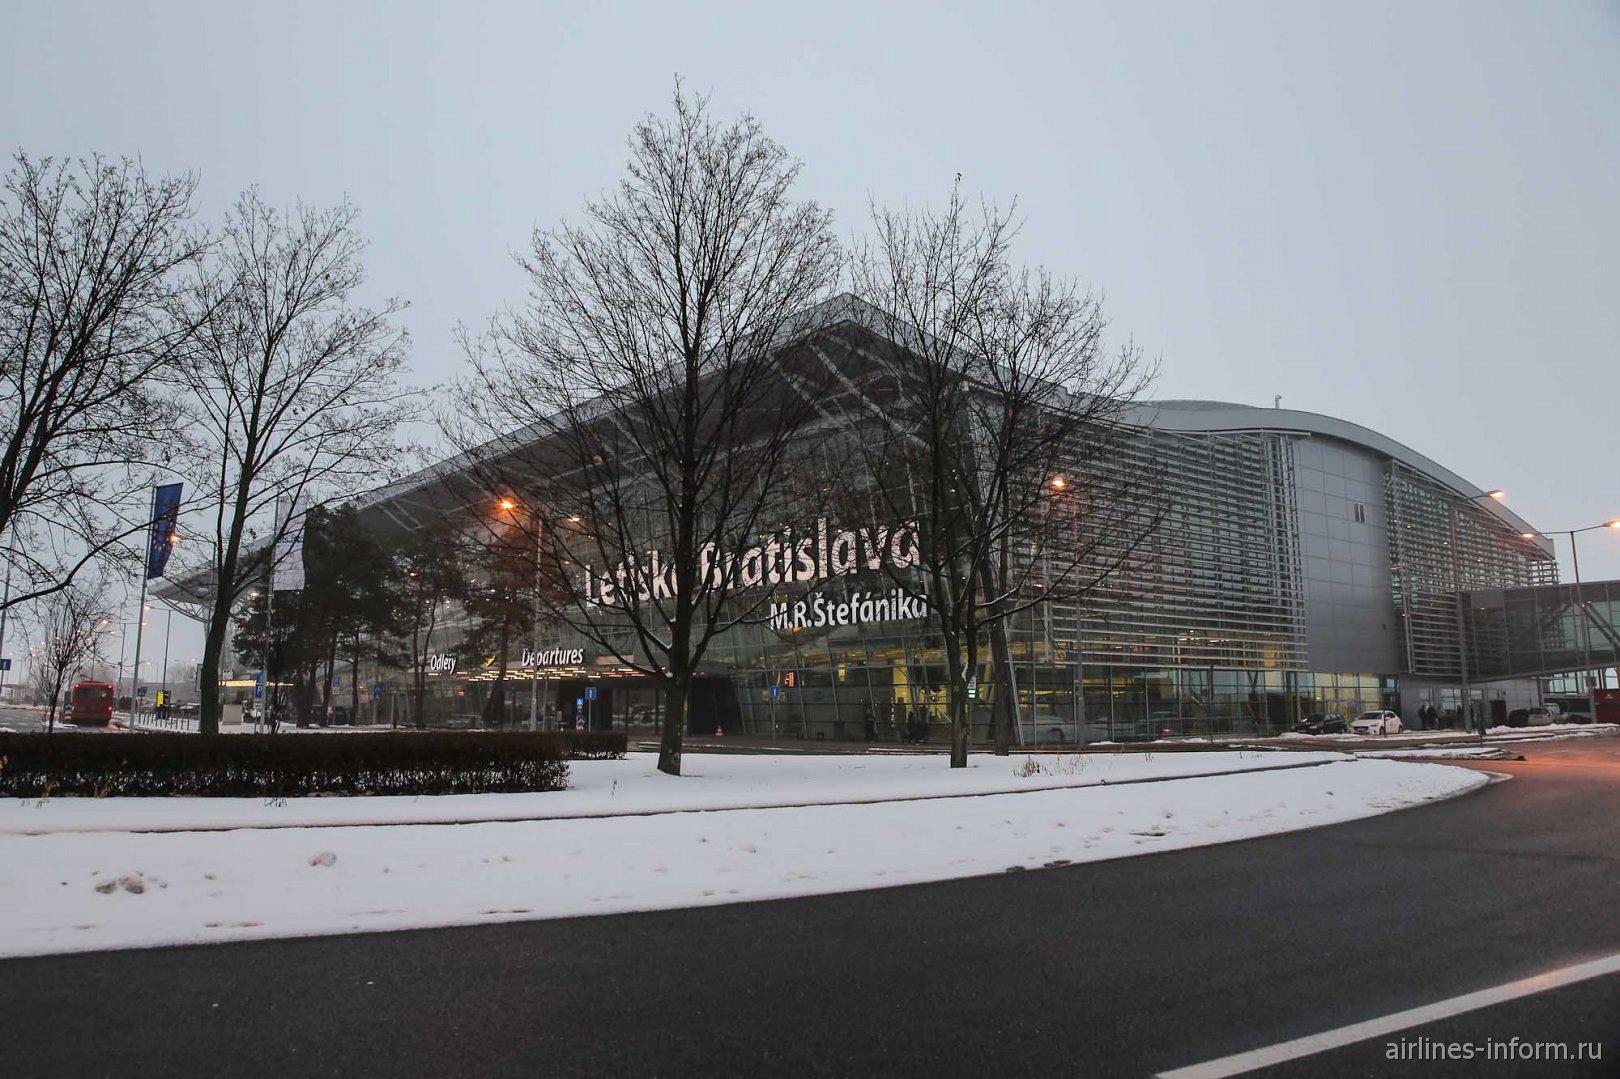 Аэровокзал аэропорта Братислава имени Мирослава Штефаника